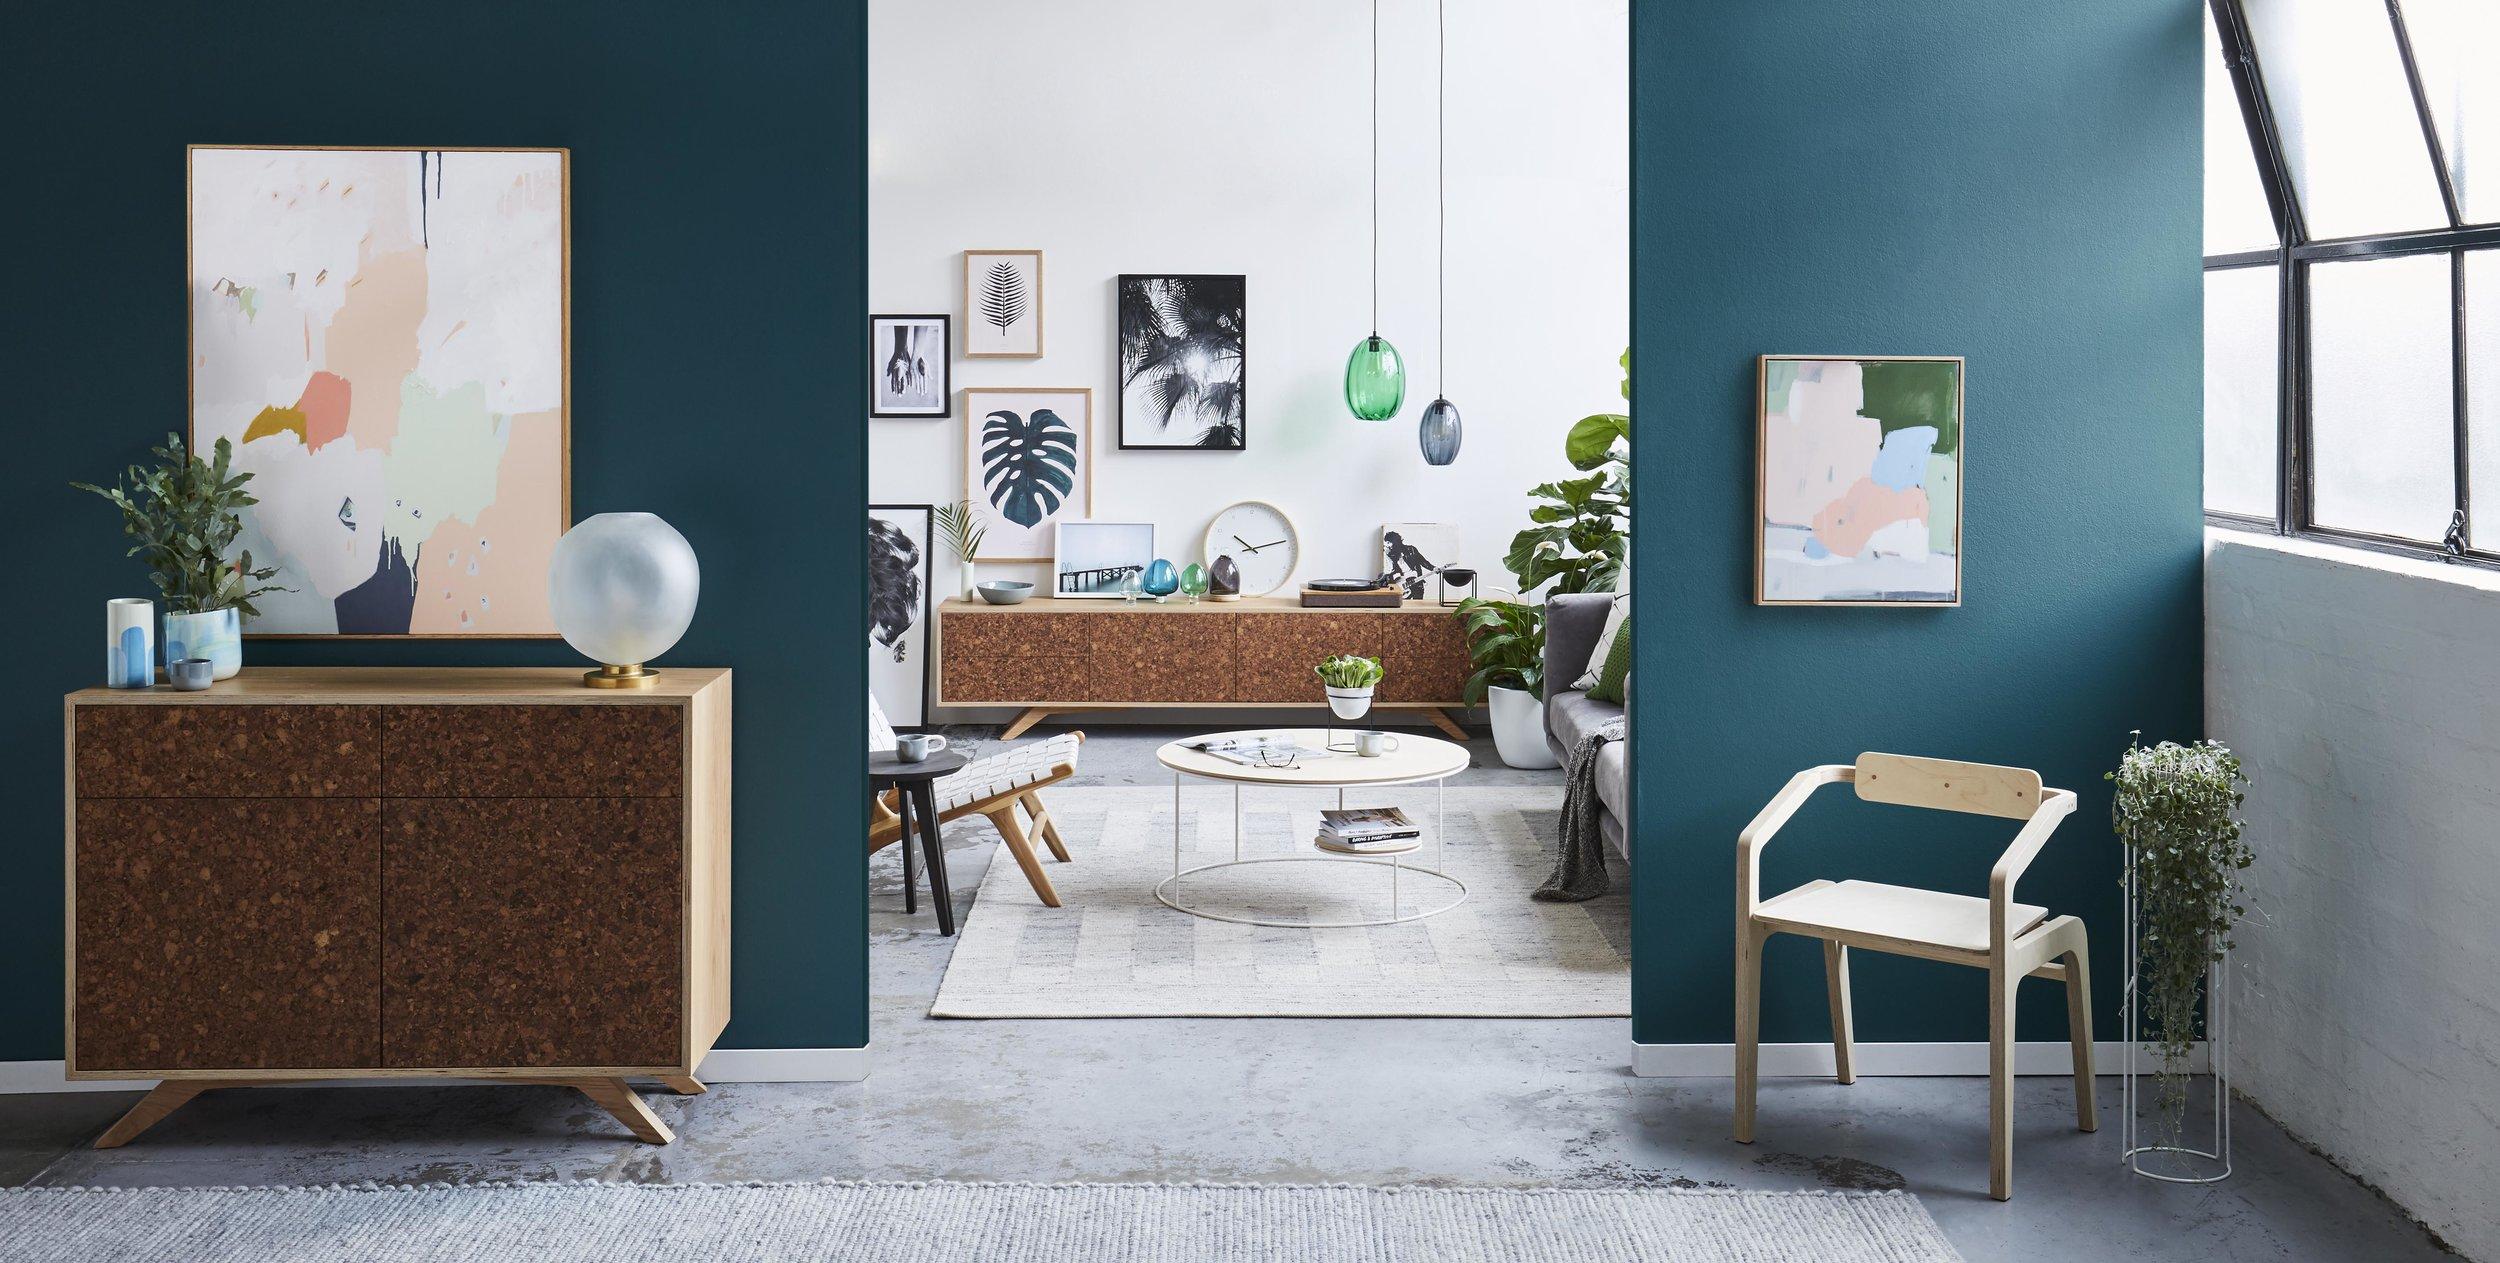 Maitland Street Interiors, Sarah Elshaug, Interior Stylist Melbourne, Felix Furniture Photo Shoot